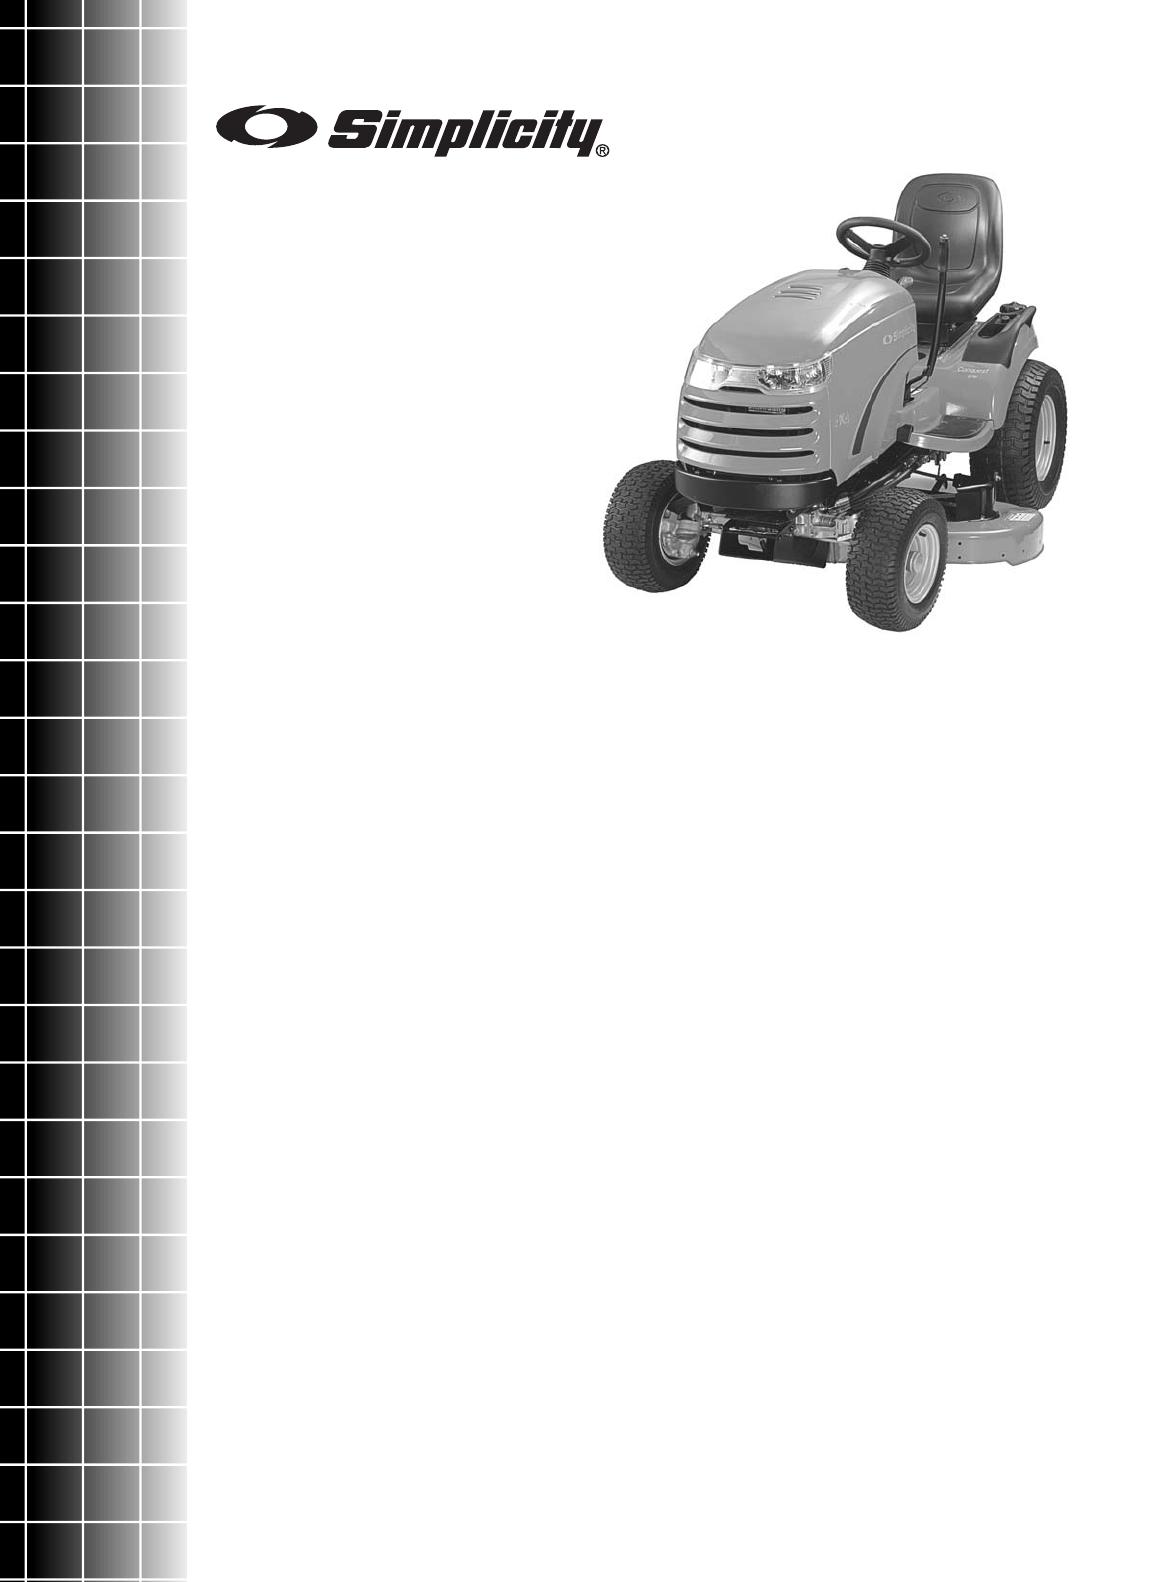 Simplicity 1695395 Parts Manual Conquest 4WD Series Garden Tractors